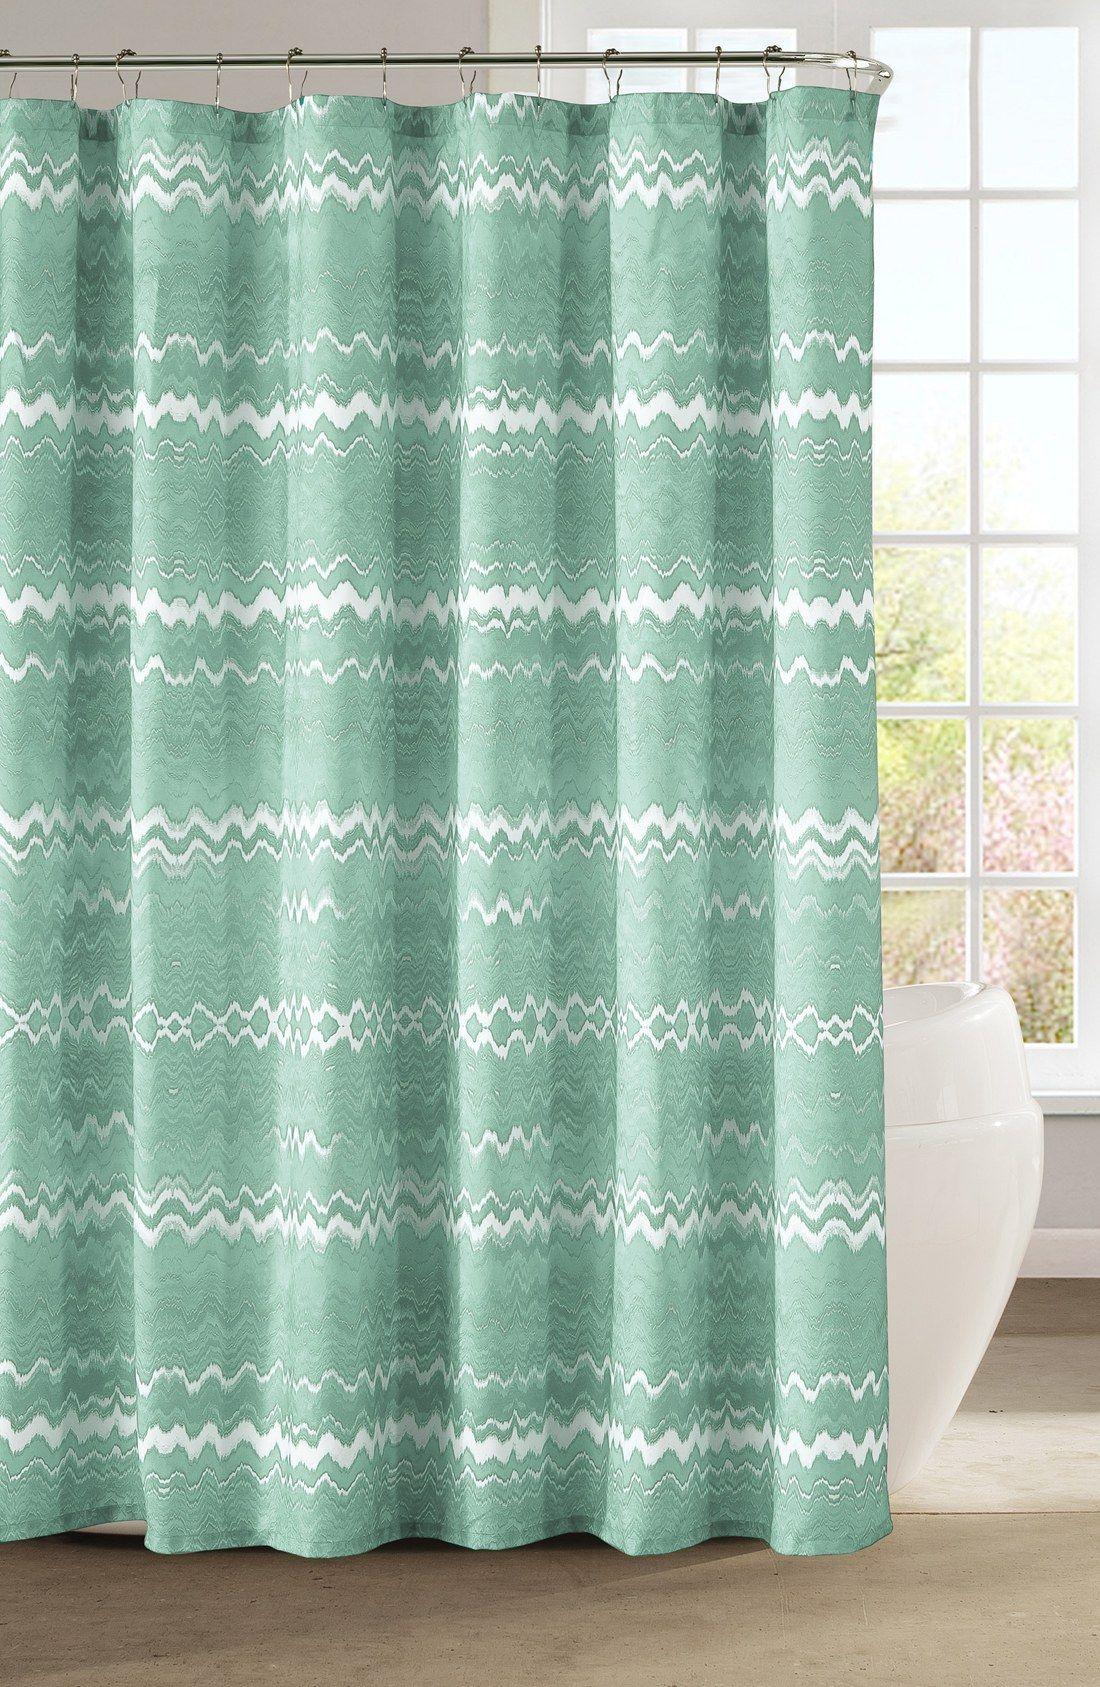 Kensie Mikaela Shower Curtain Cortinas De Bano Disenos De